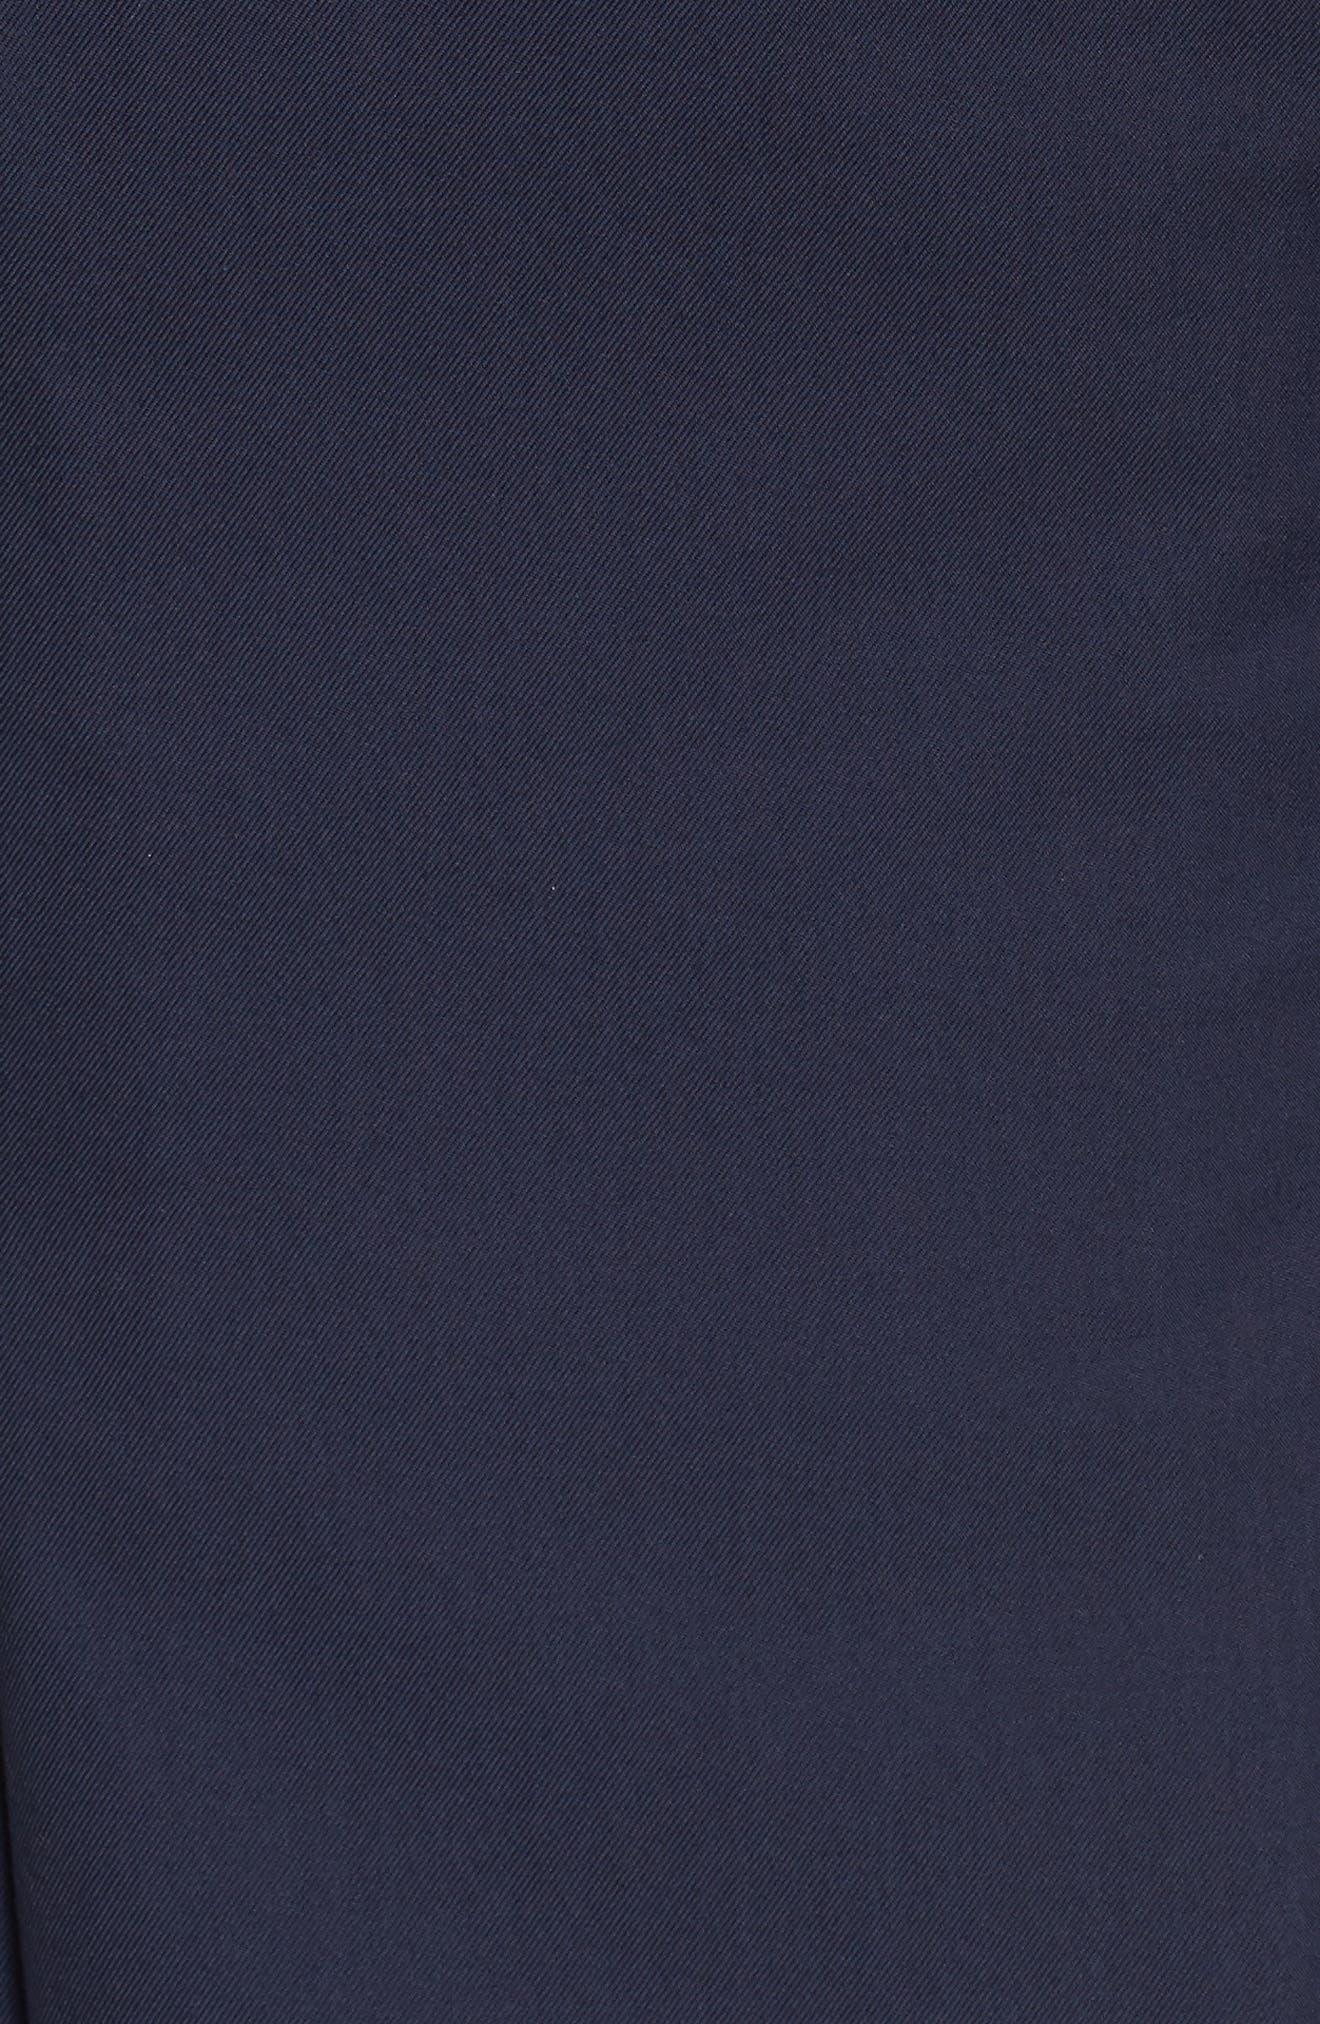 Blouson Sleeve A-Line Twill Dress,                             Alternate thumbnail 5, color,                             410